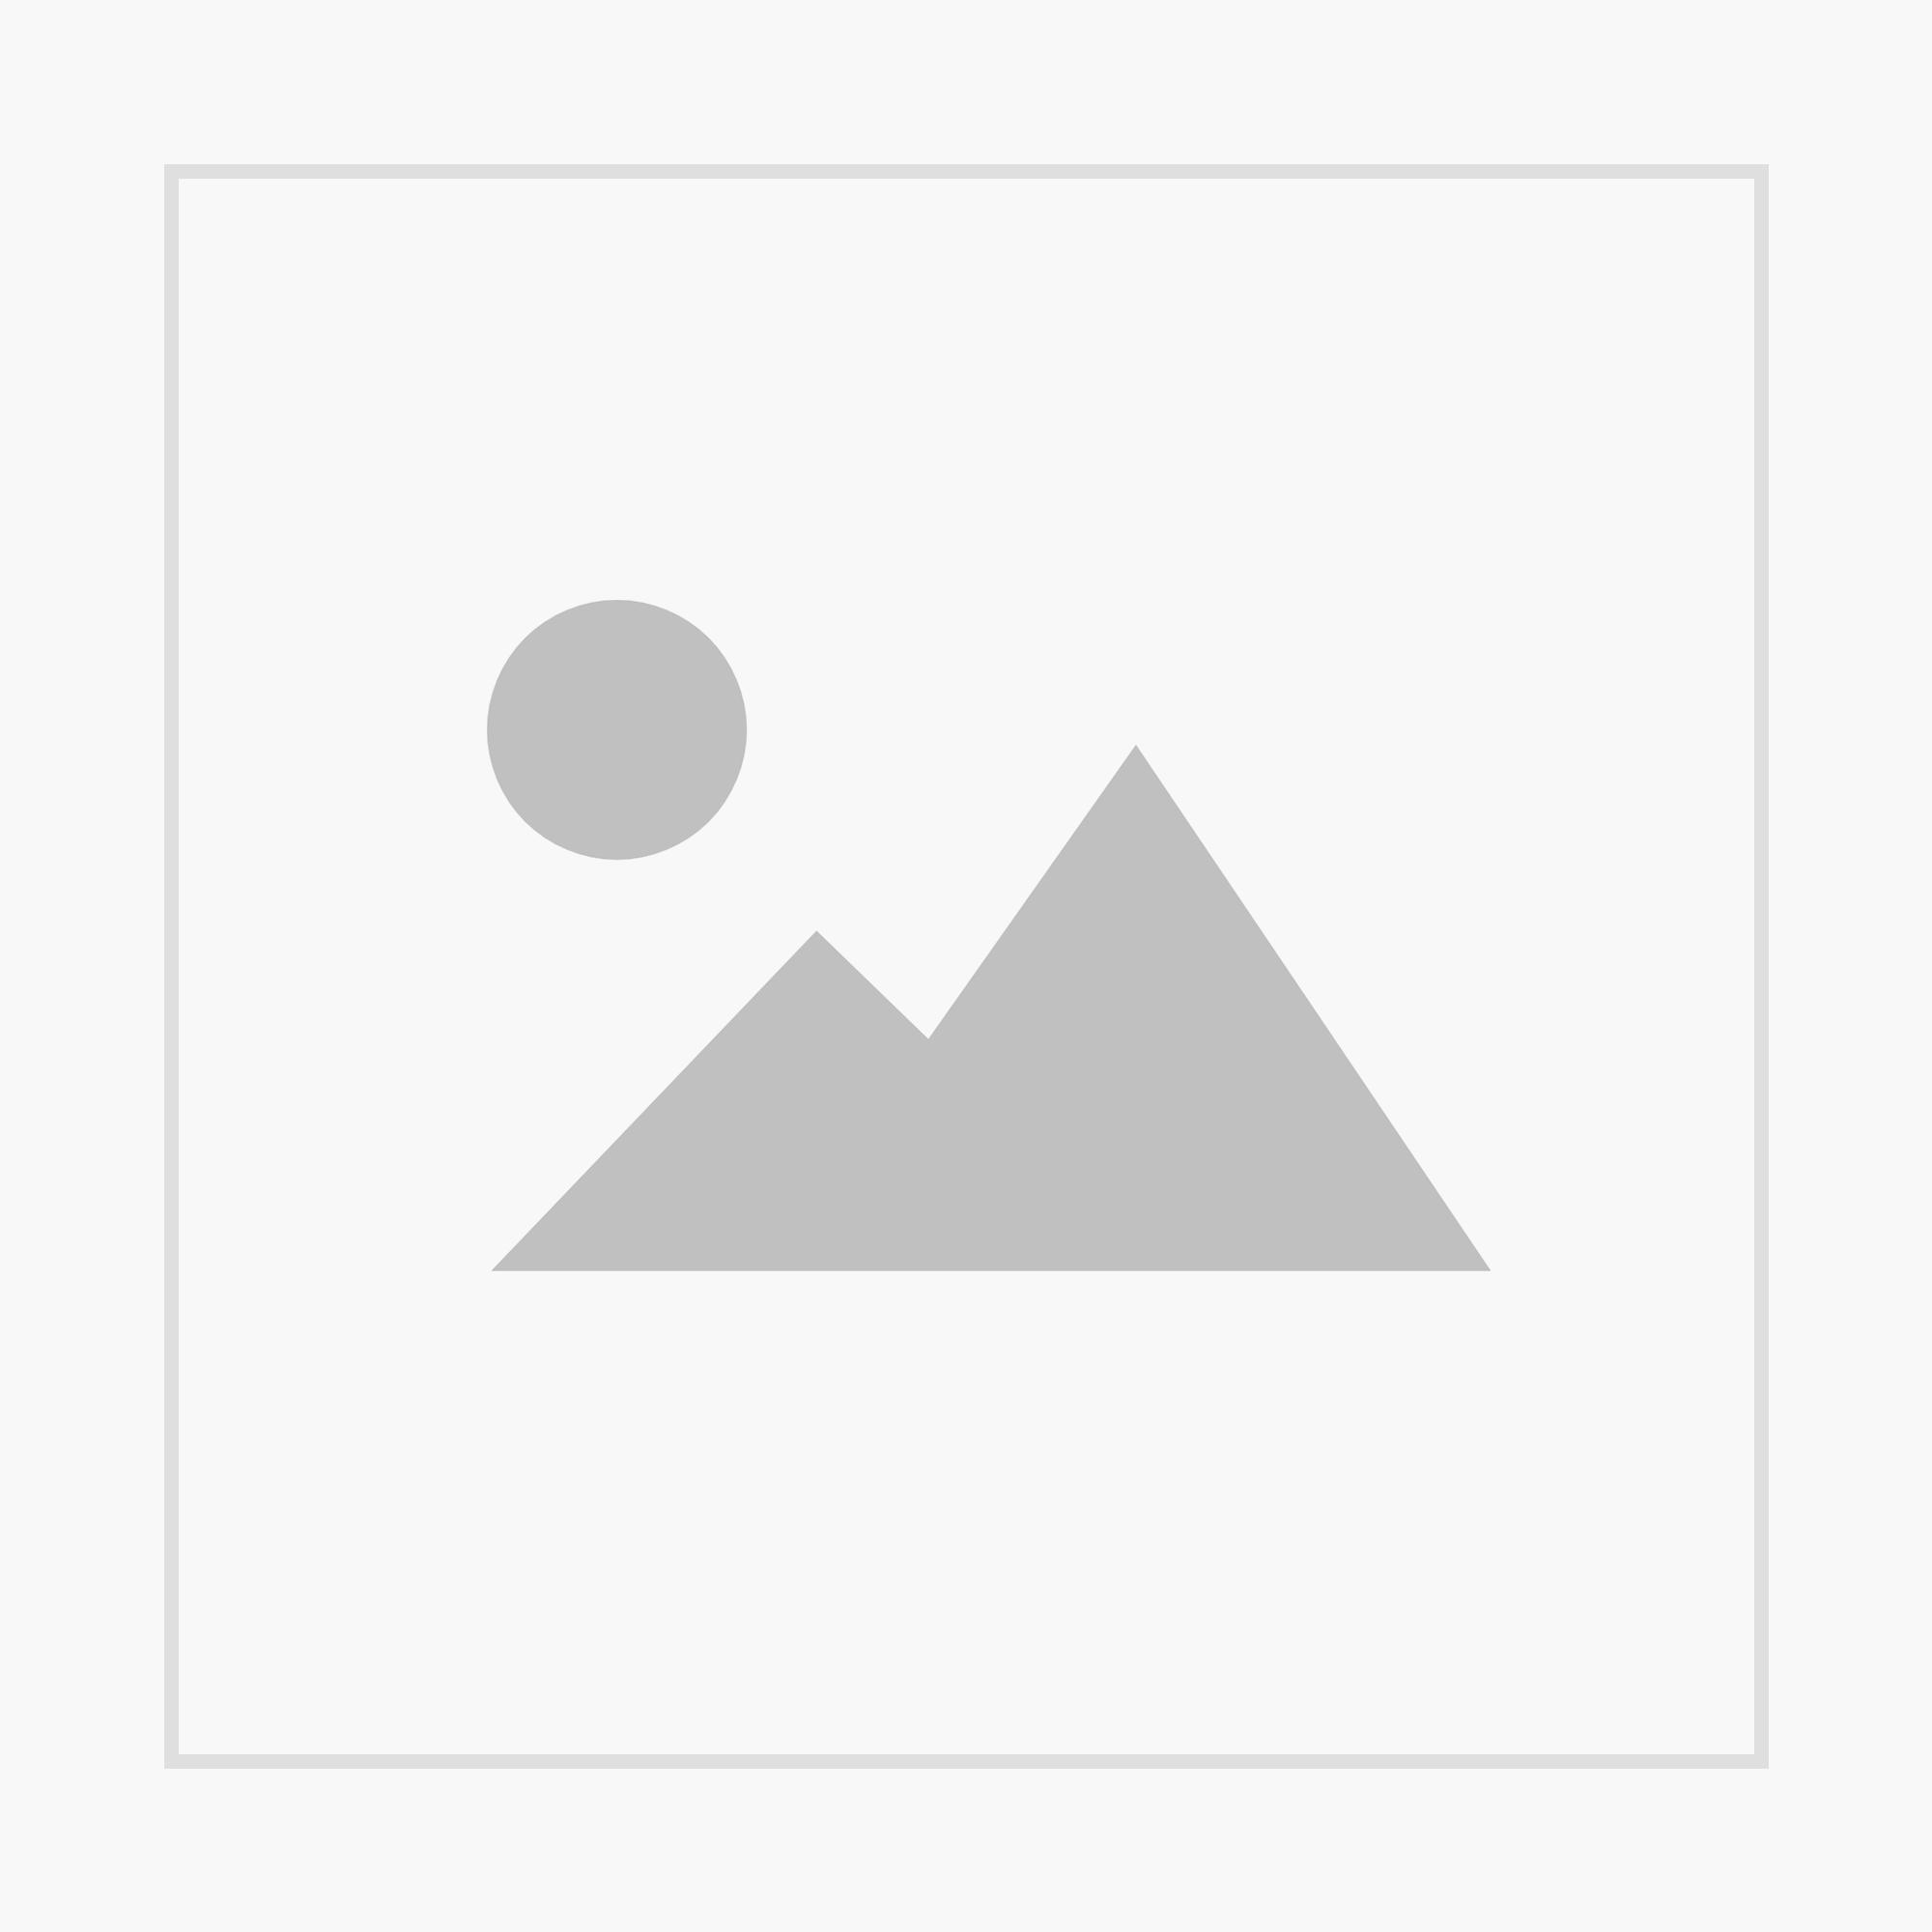 Leckere Erdbeer-Zaubereien